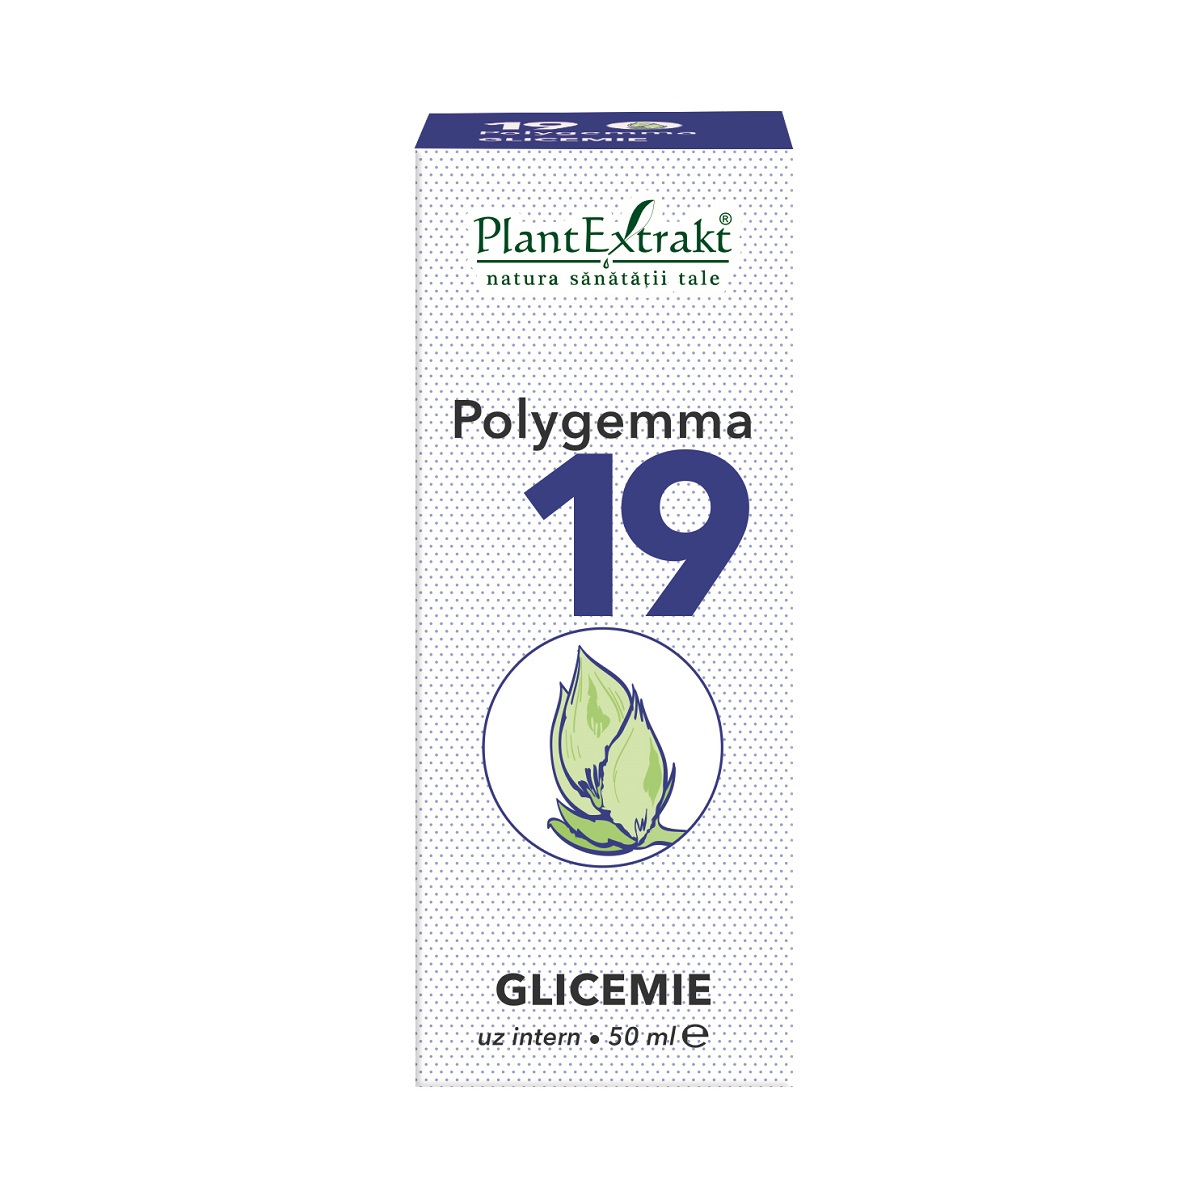 Polygemma 19 Glicemie, 50 ml, Plant Extrakt